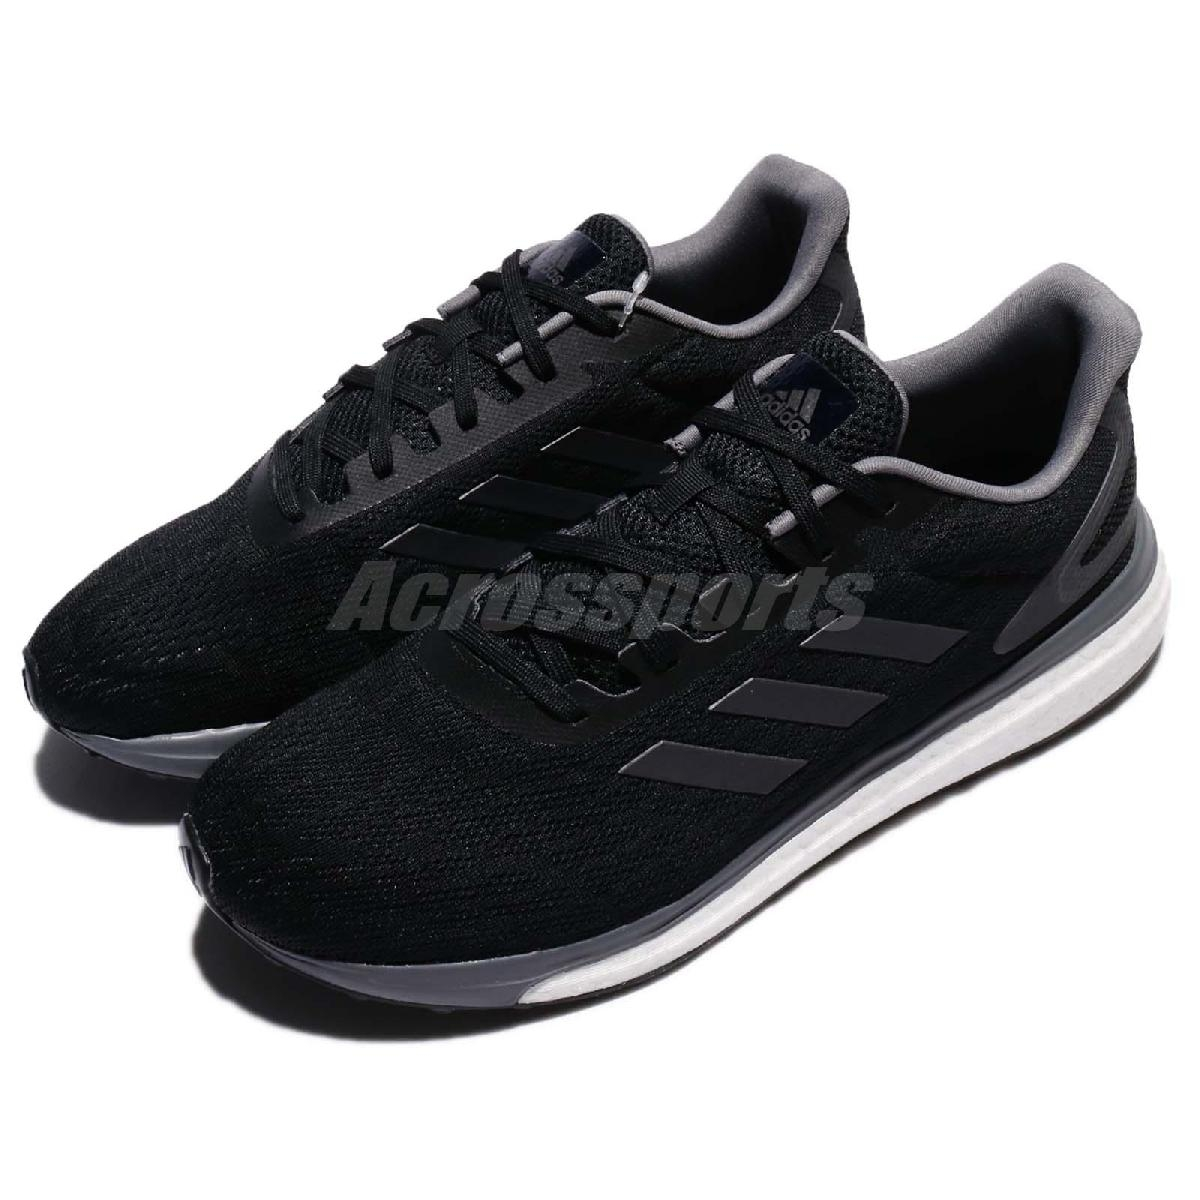 adidas 慢跑鞋 Response LT M 黑 白 BOOST中底 運動鞋 黑白 男鞋【PUMP306】 BB3617